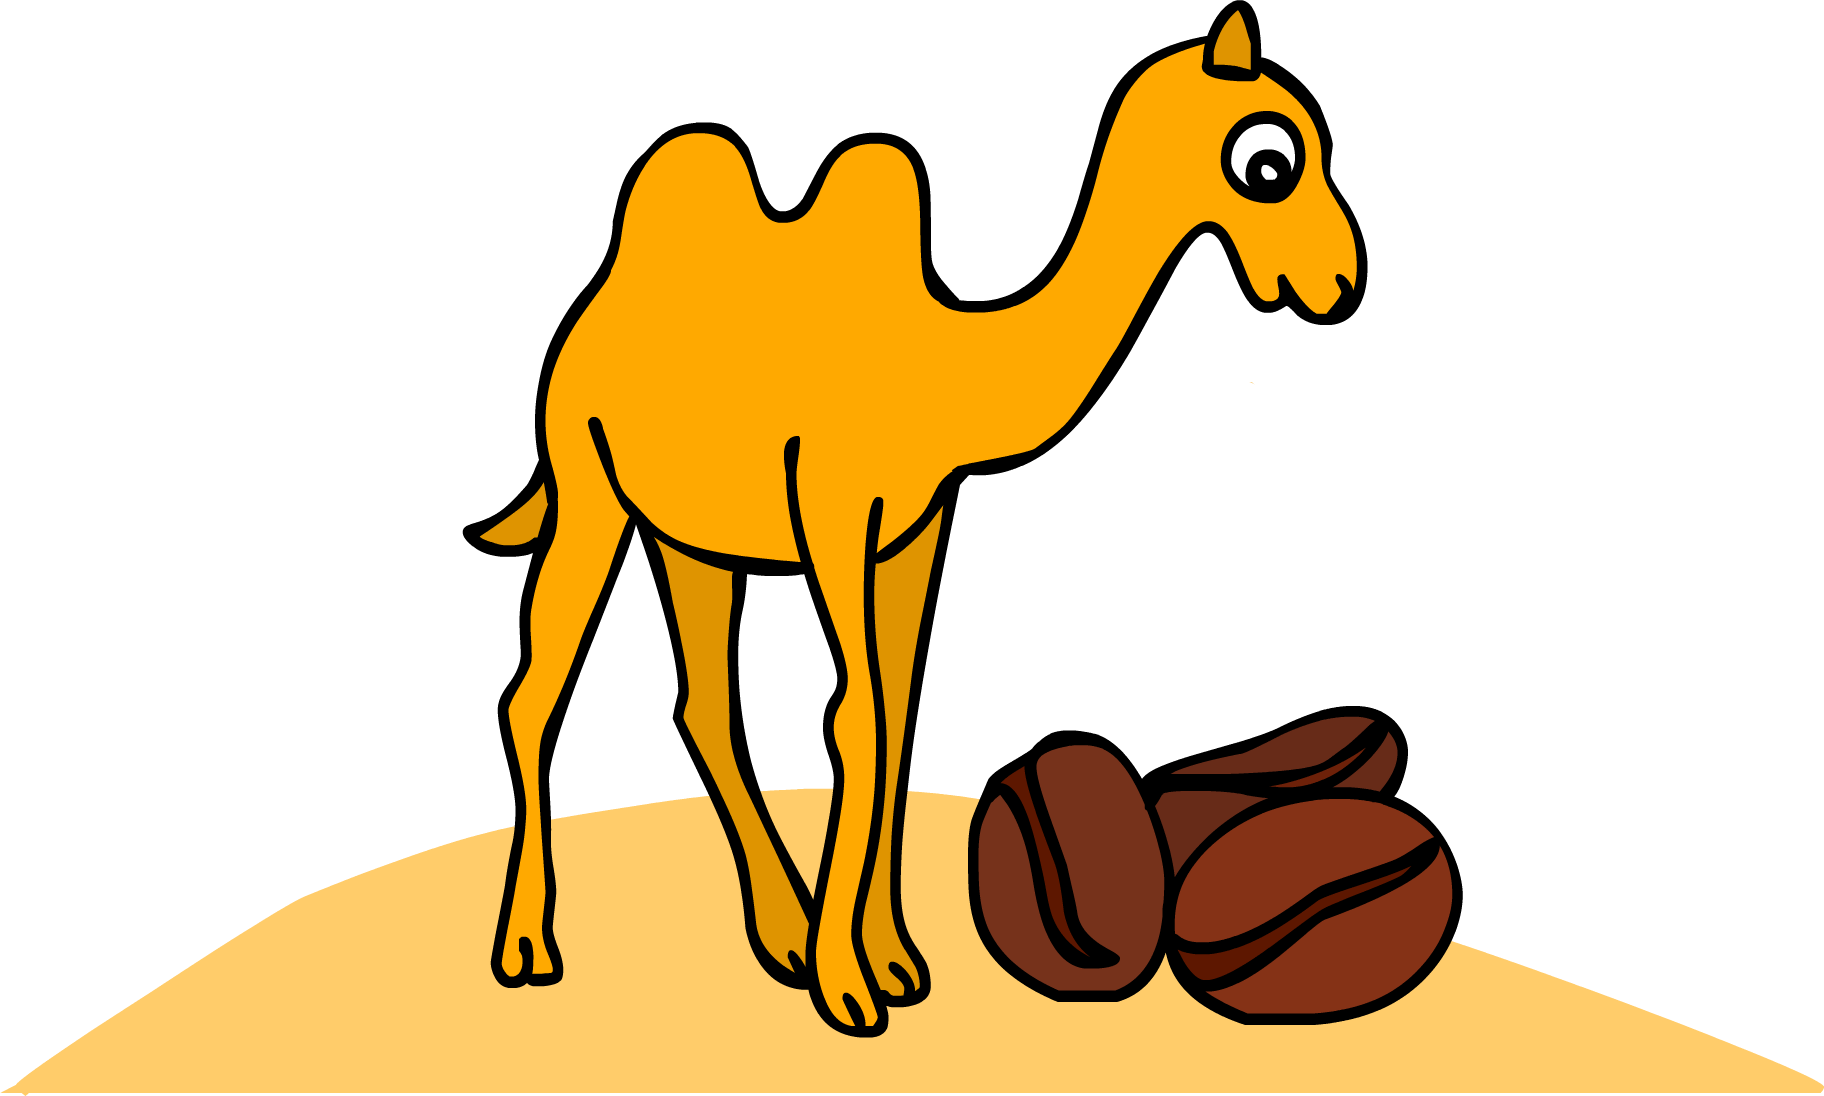 eo-yaml-logo